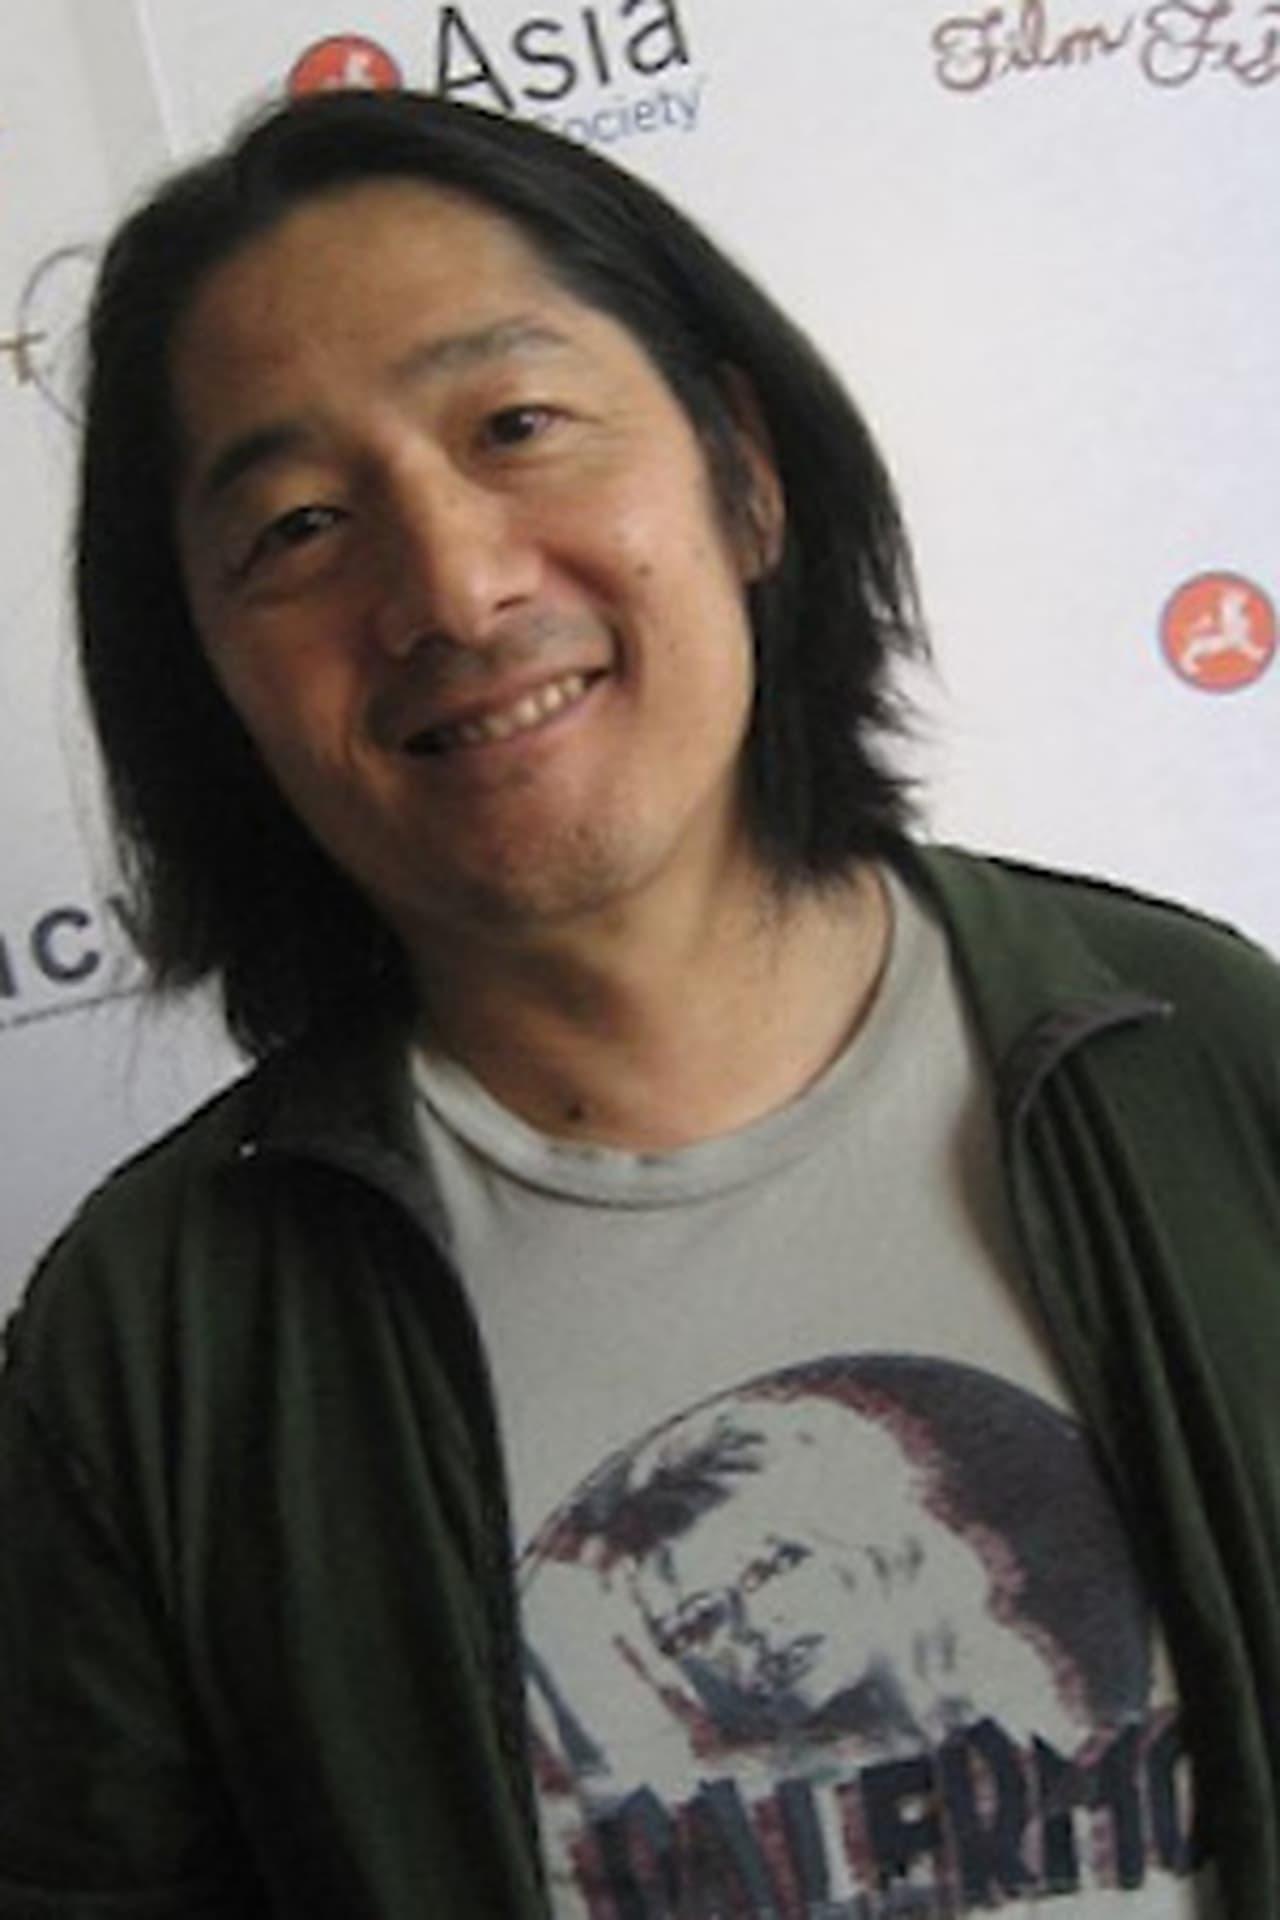 Desmond Nakano